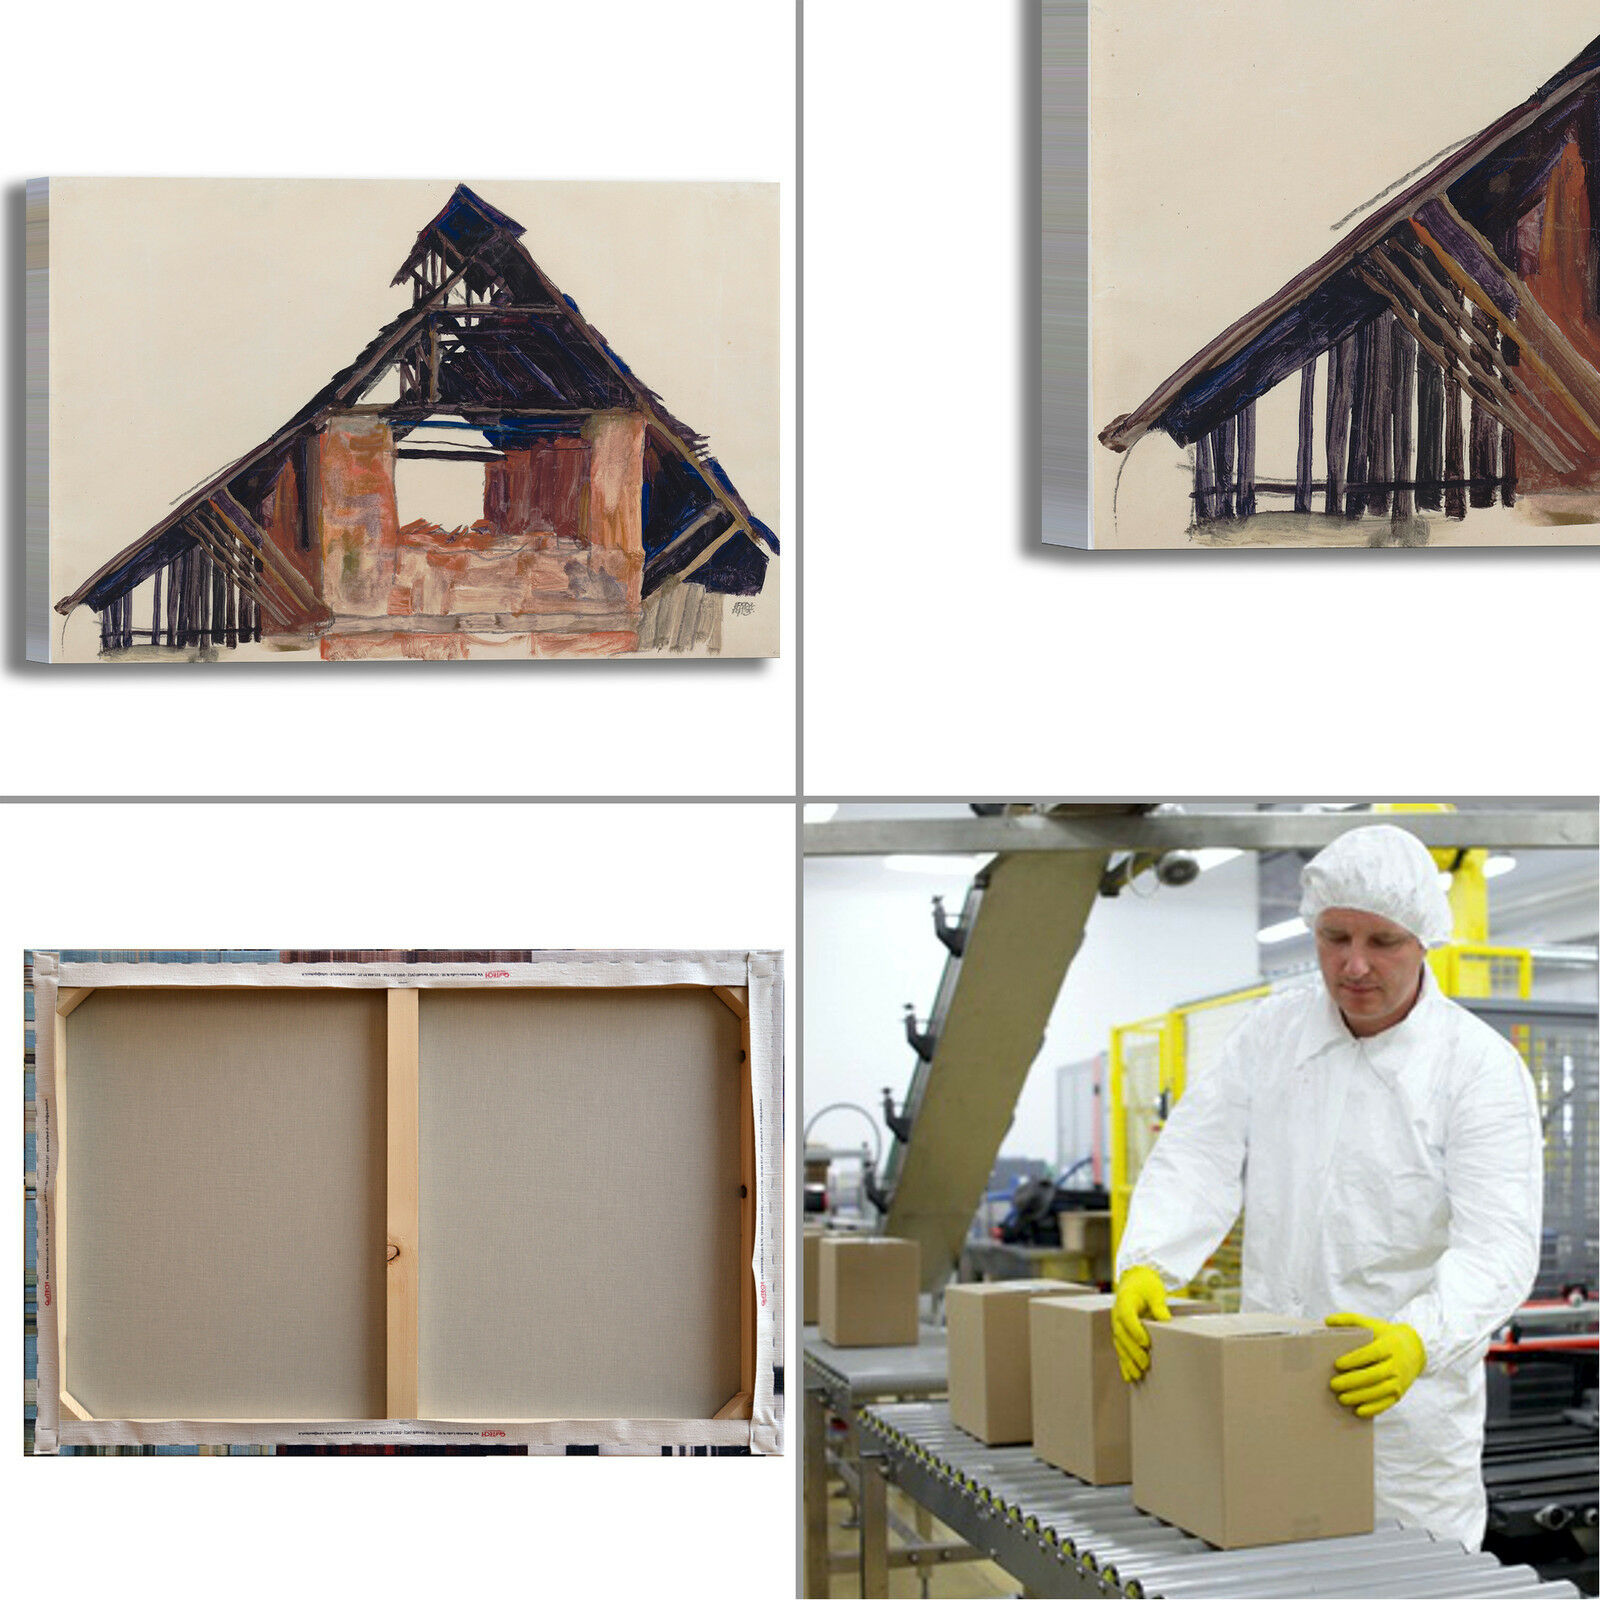 Schiele arRouge vecchio timpano design quadro stampa tela dipinto telaio arRouge Schiele o casa 946647